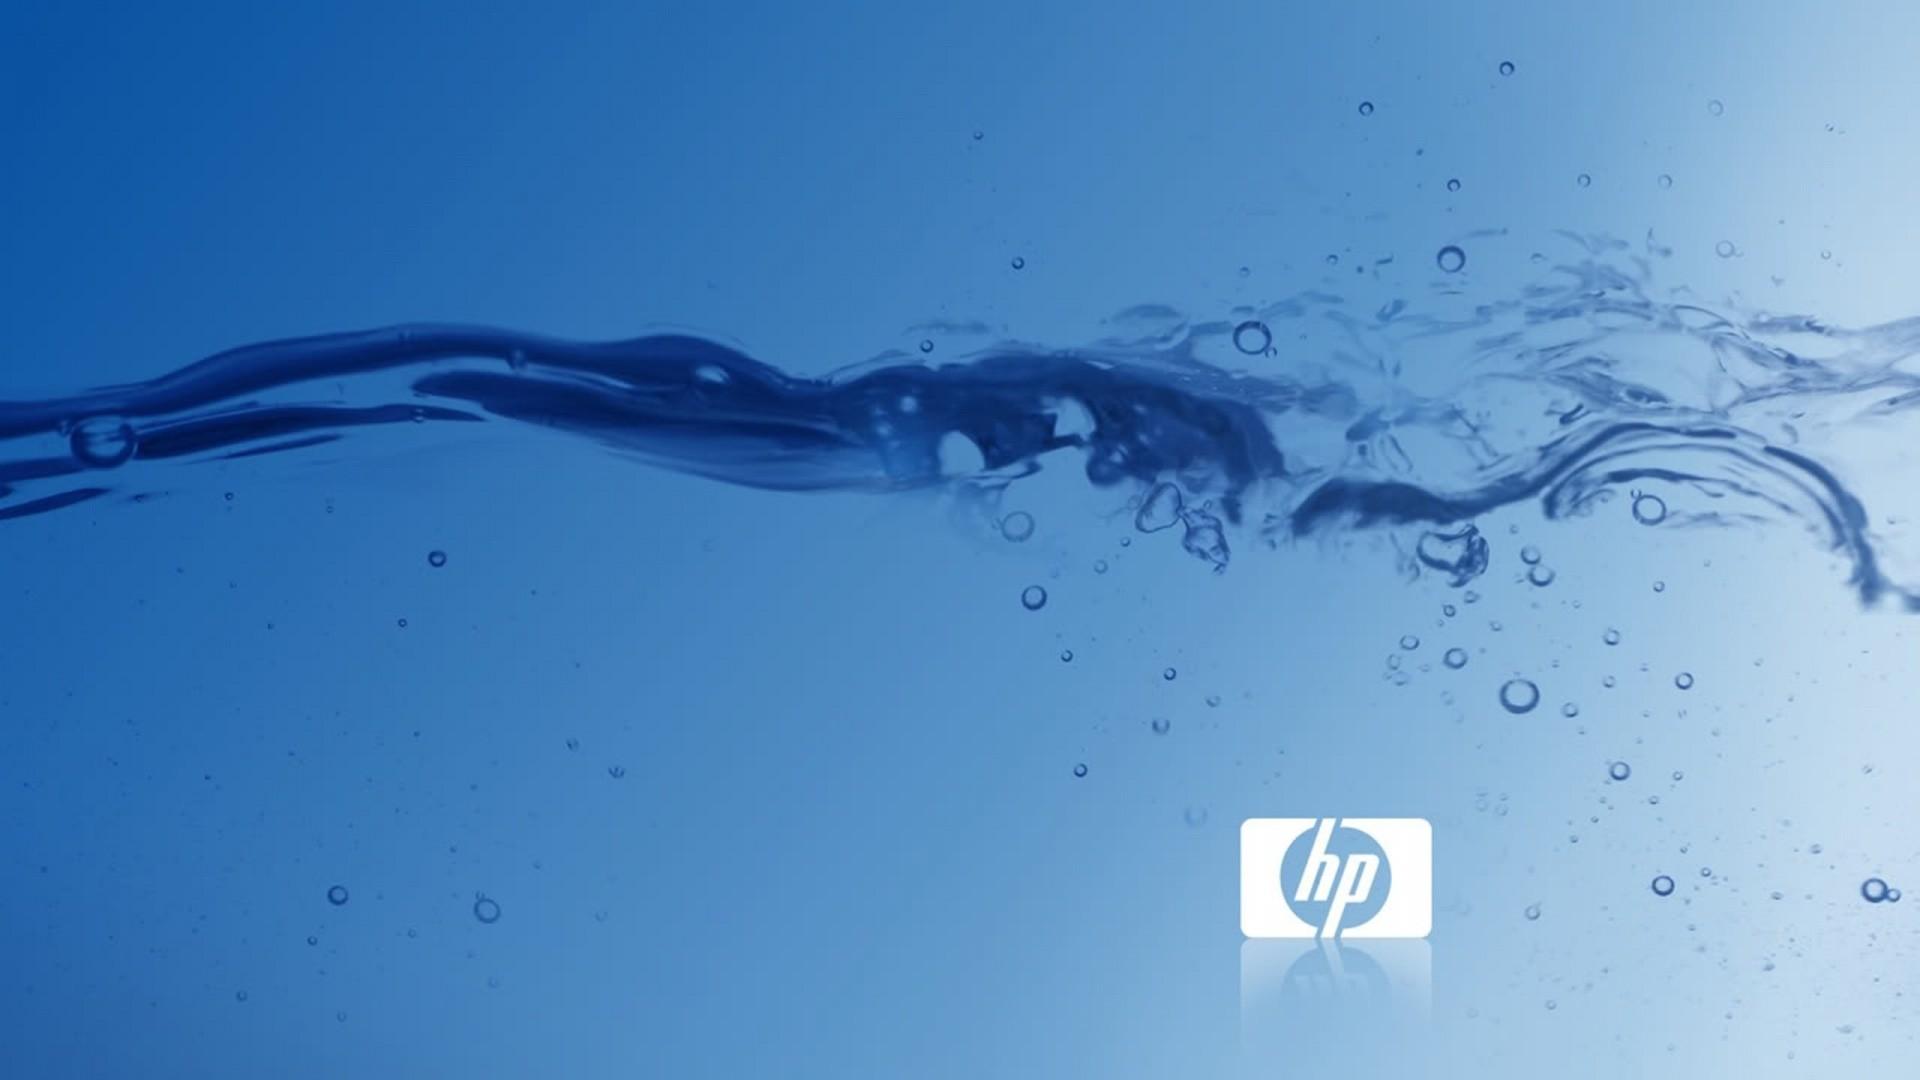 Photos HP Wallpapers HD.